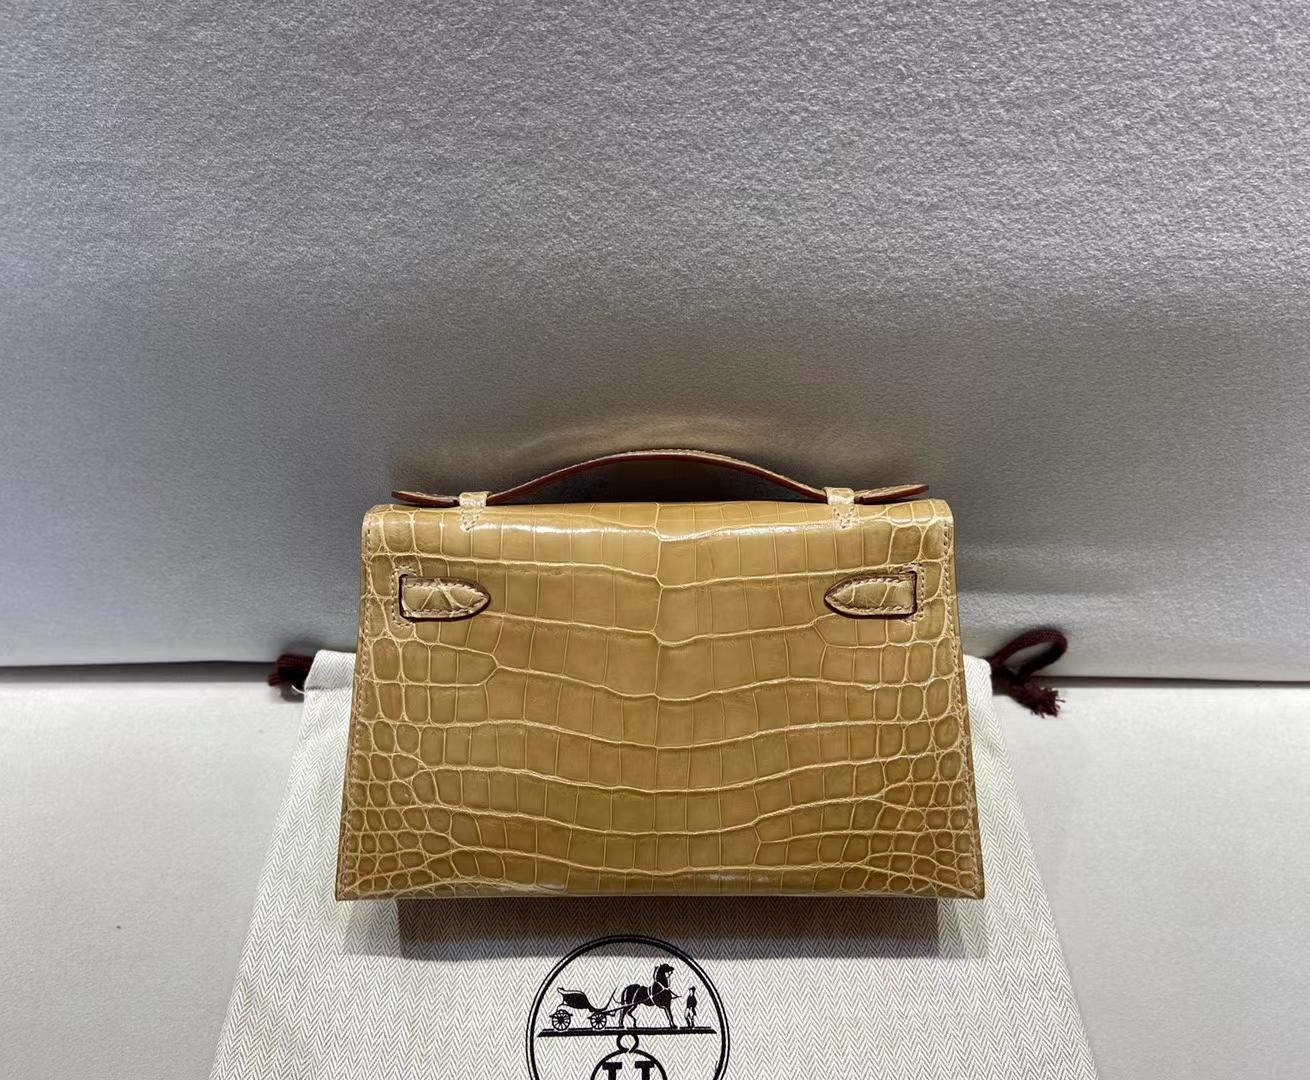 Hermès(爱马仕)miniKelly 22cm 一代  鳄鱼亮面 香草色 金扣